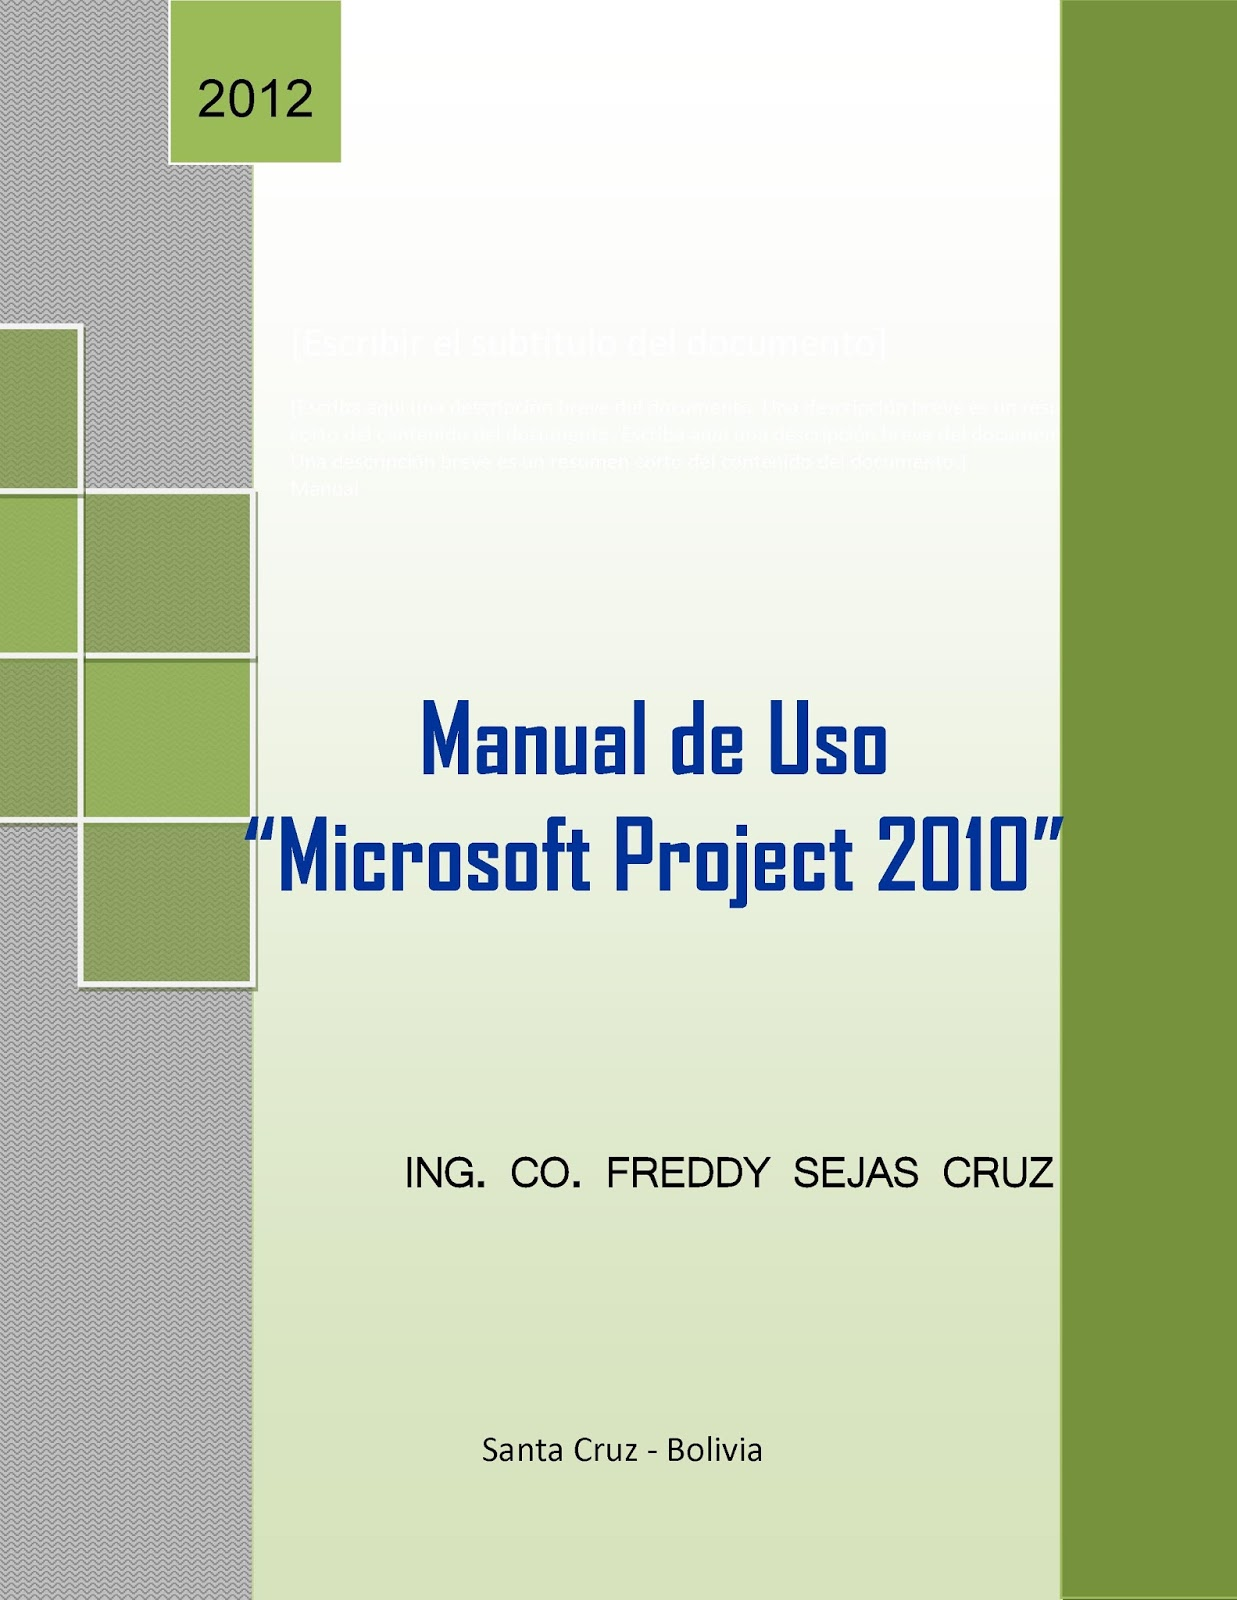 Manual de Uso Microsoft Project 2010